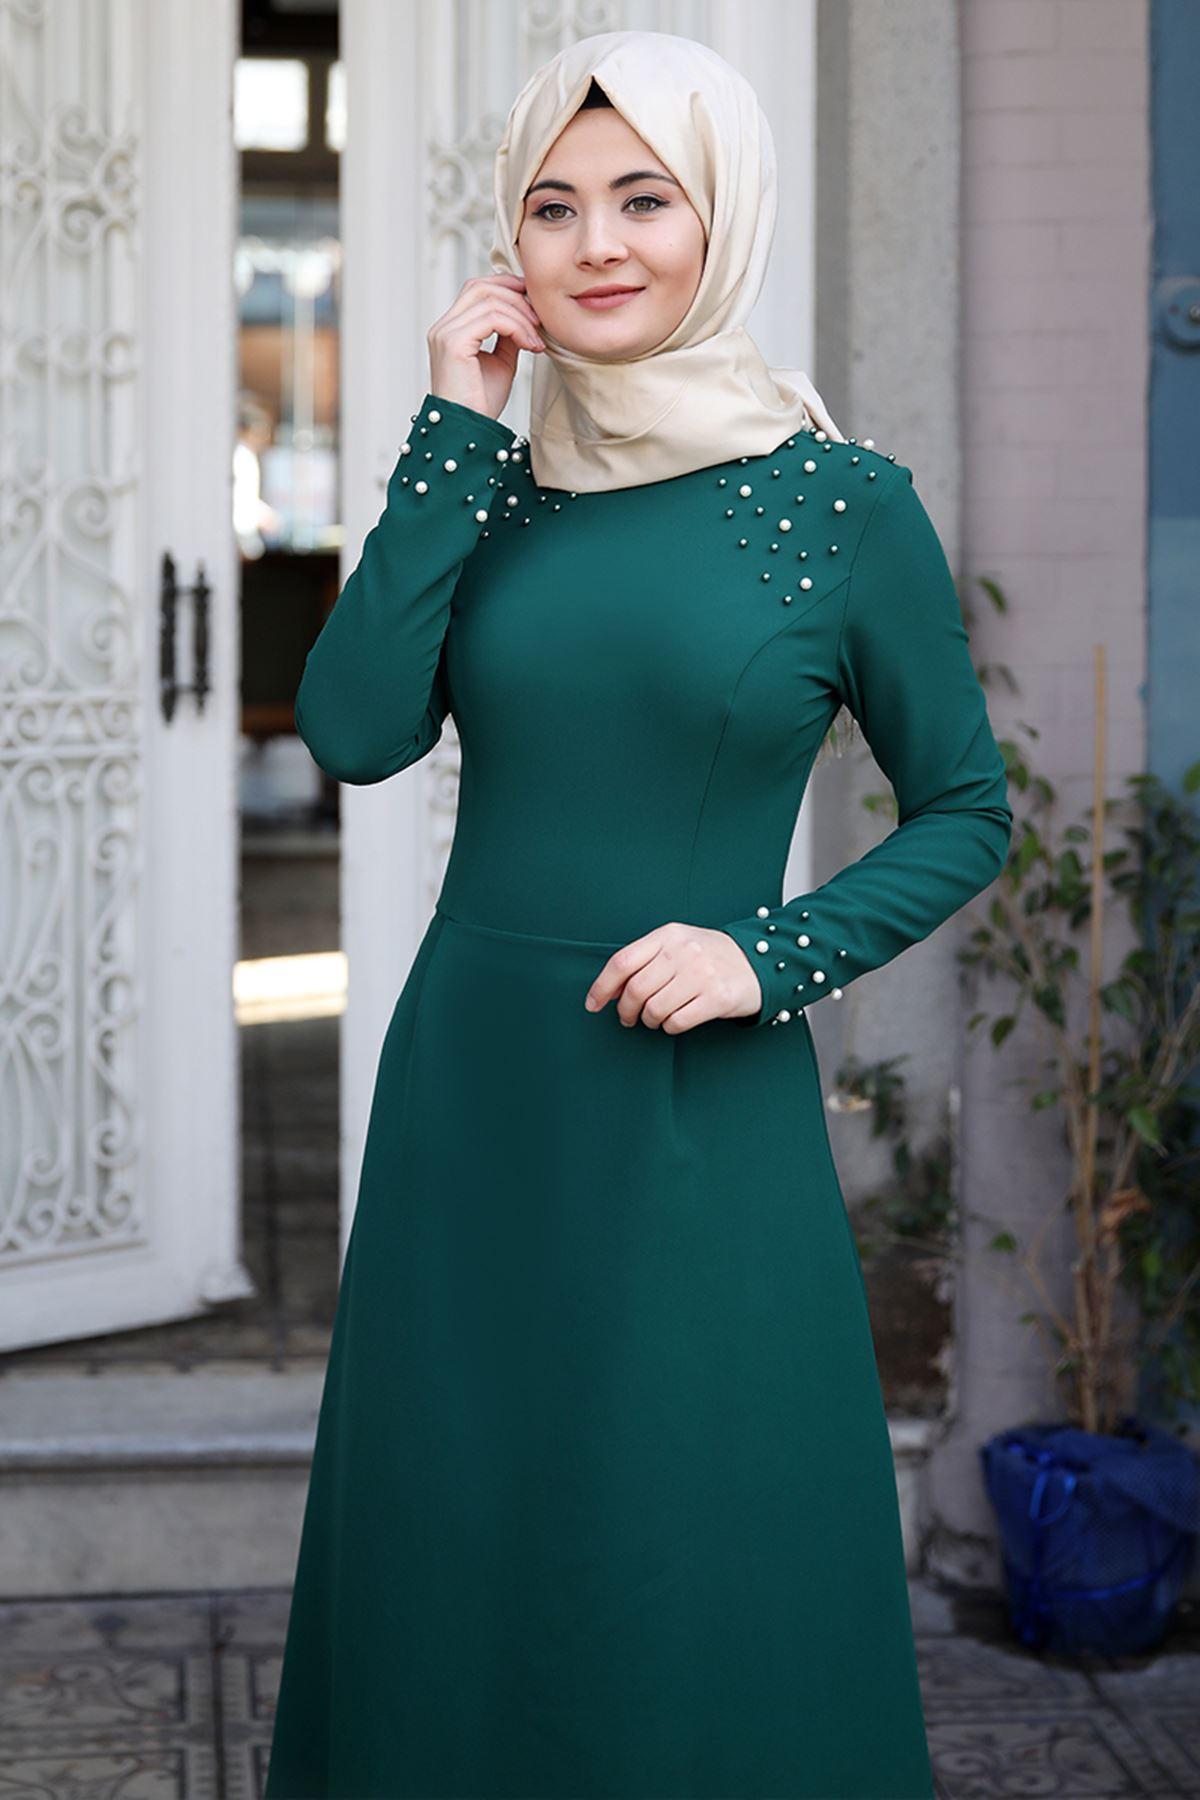 Sümay Omuz Taşlı Elbise Zümrüt